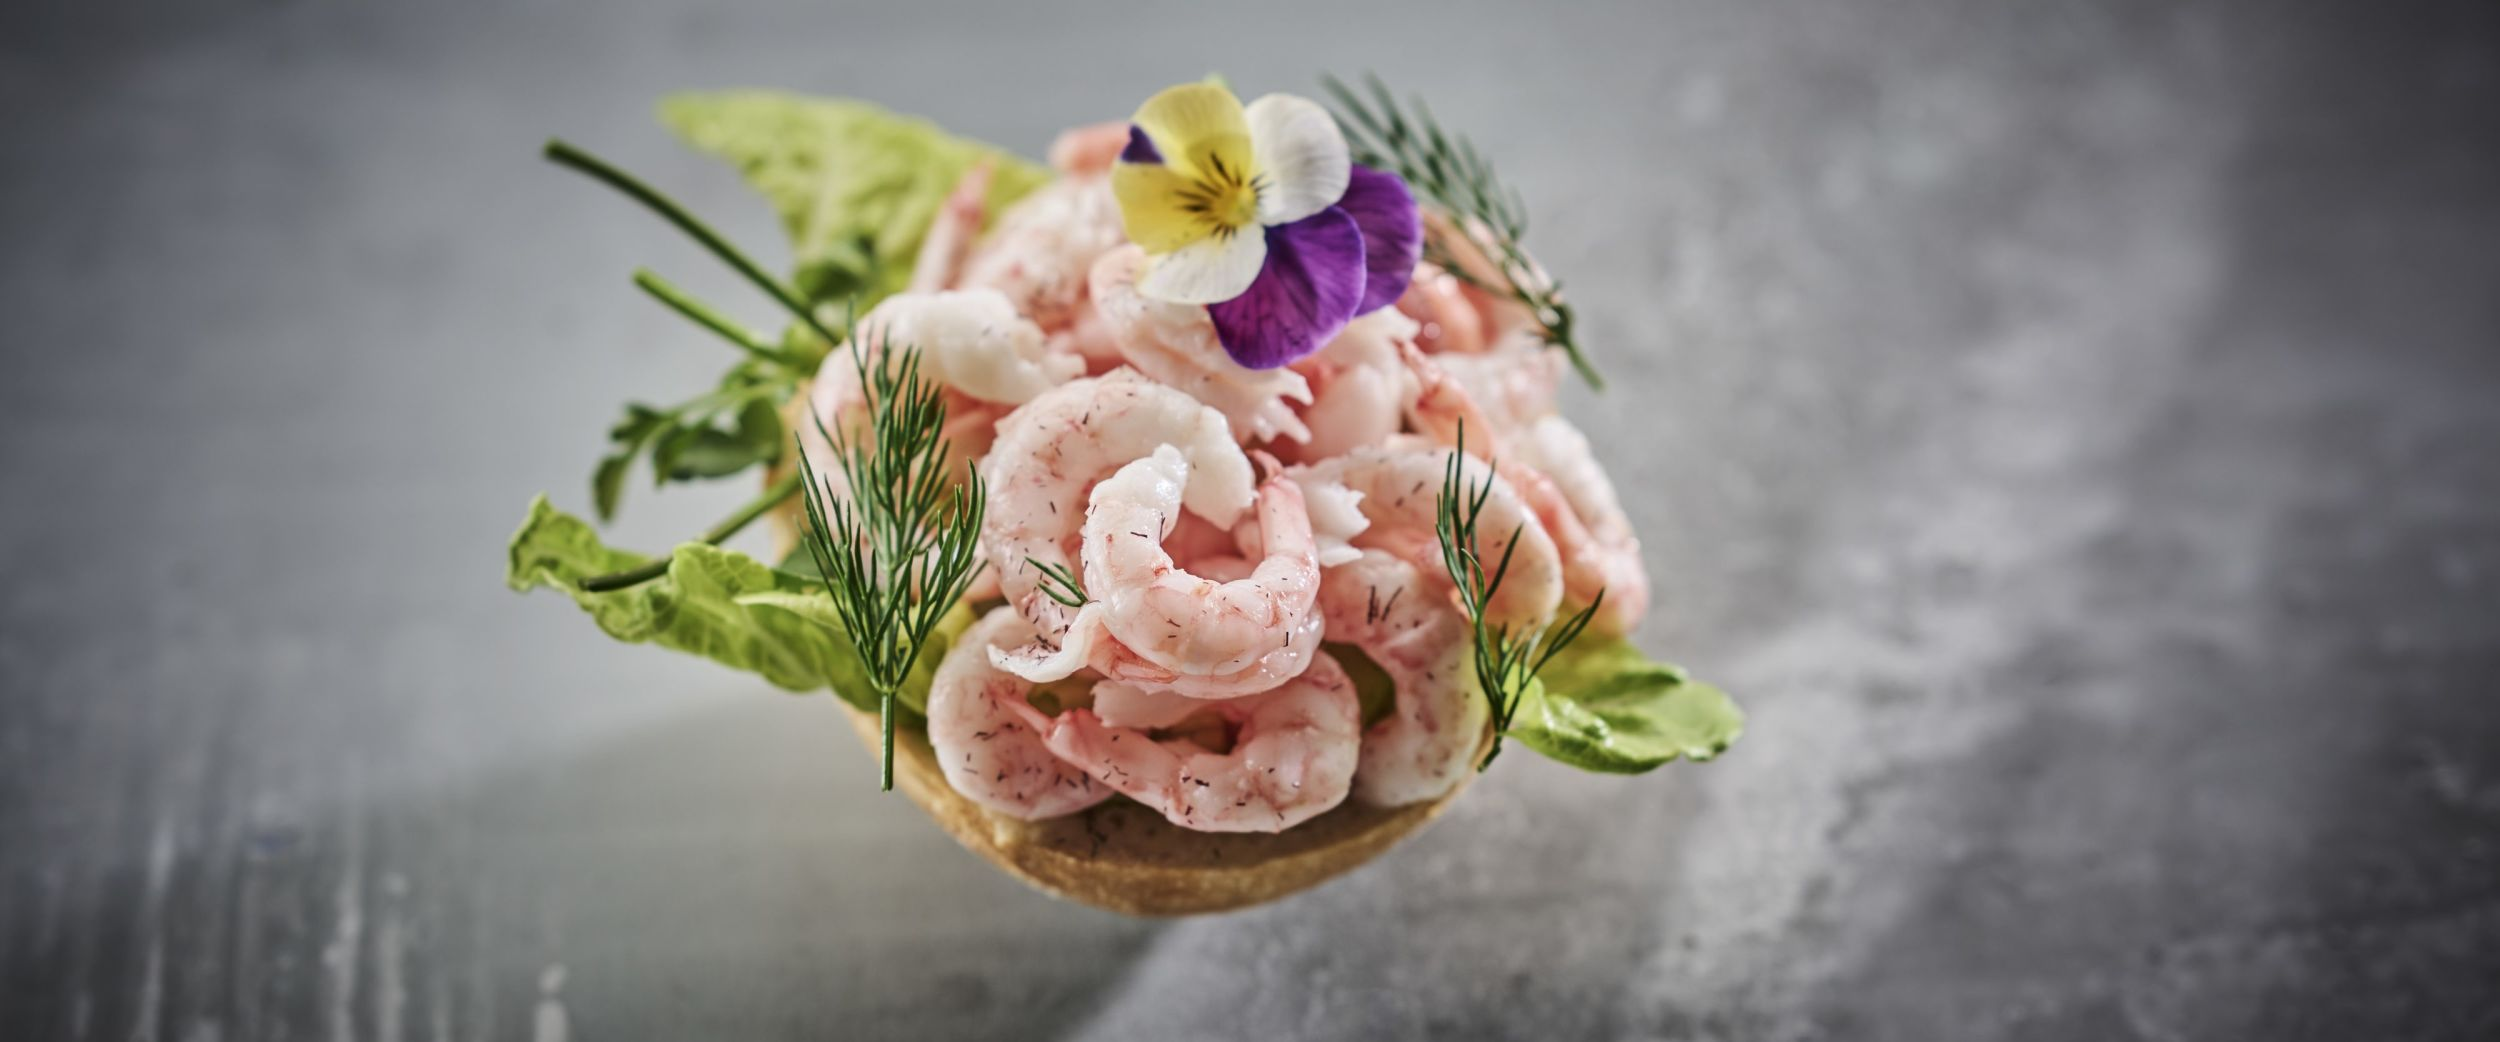 Shrimp sandwich from Havly Café - Havila Food Stories, photo by Tom Haga